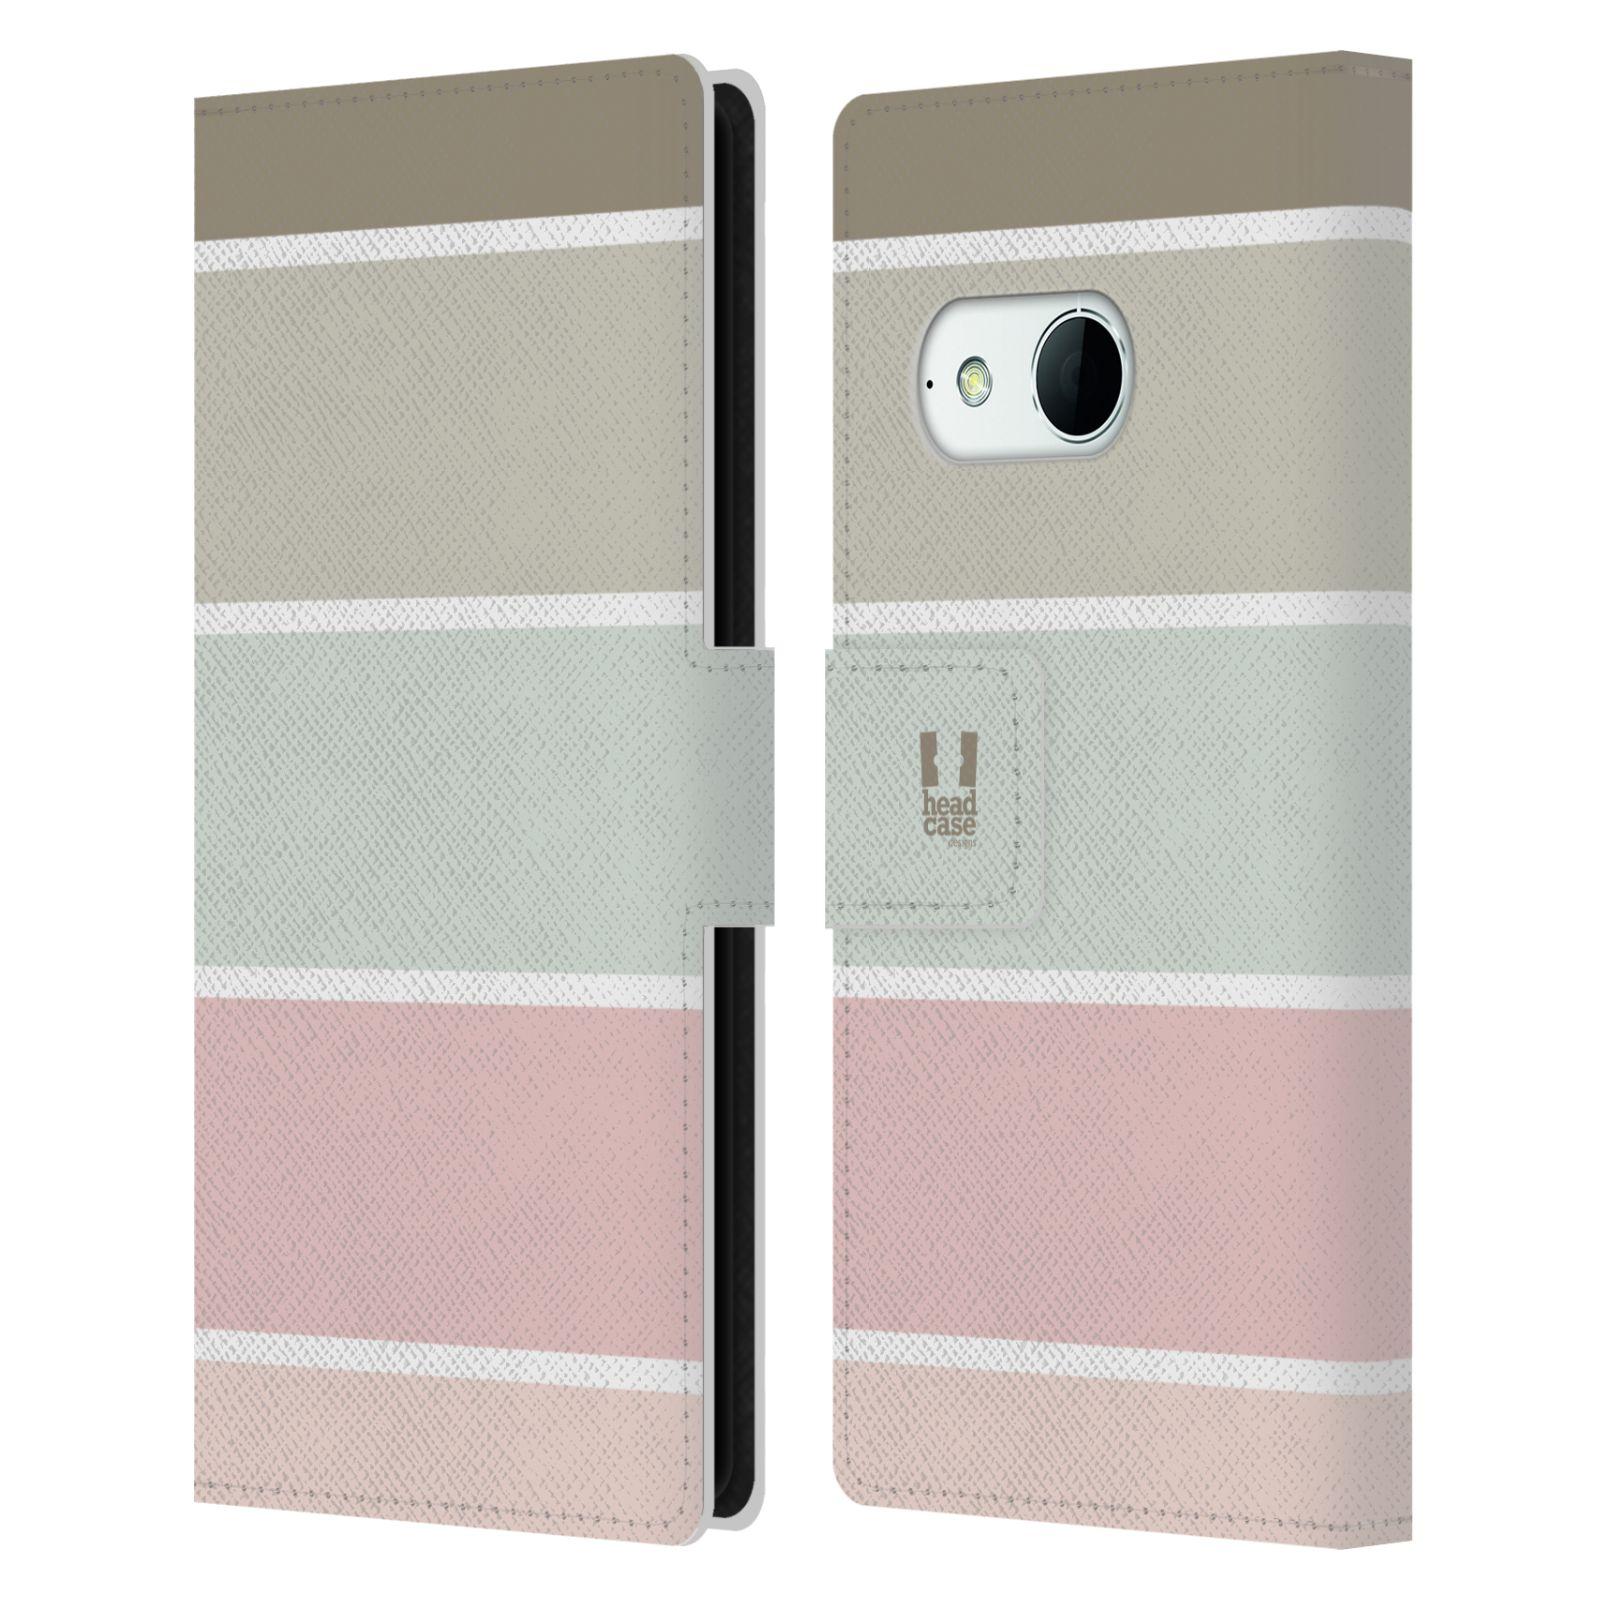 HEAD CASE Flipové pouzdro pro mobil HTC ONE MINI 2 (M8) Francouzský venkov pruhy růžová a šedá